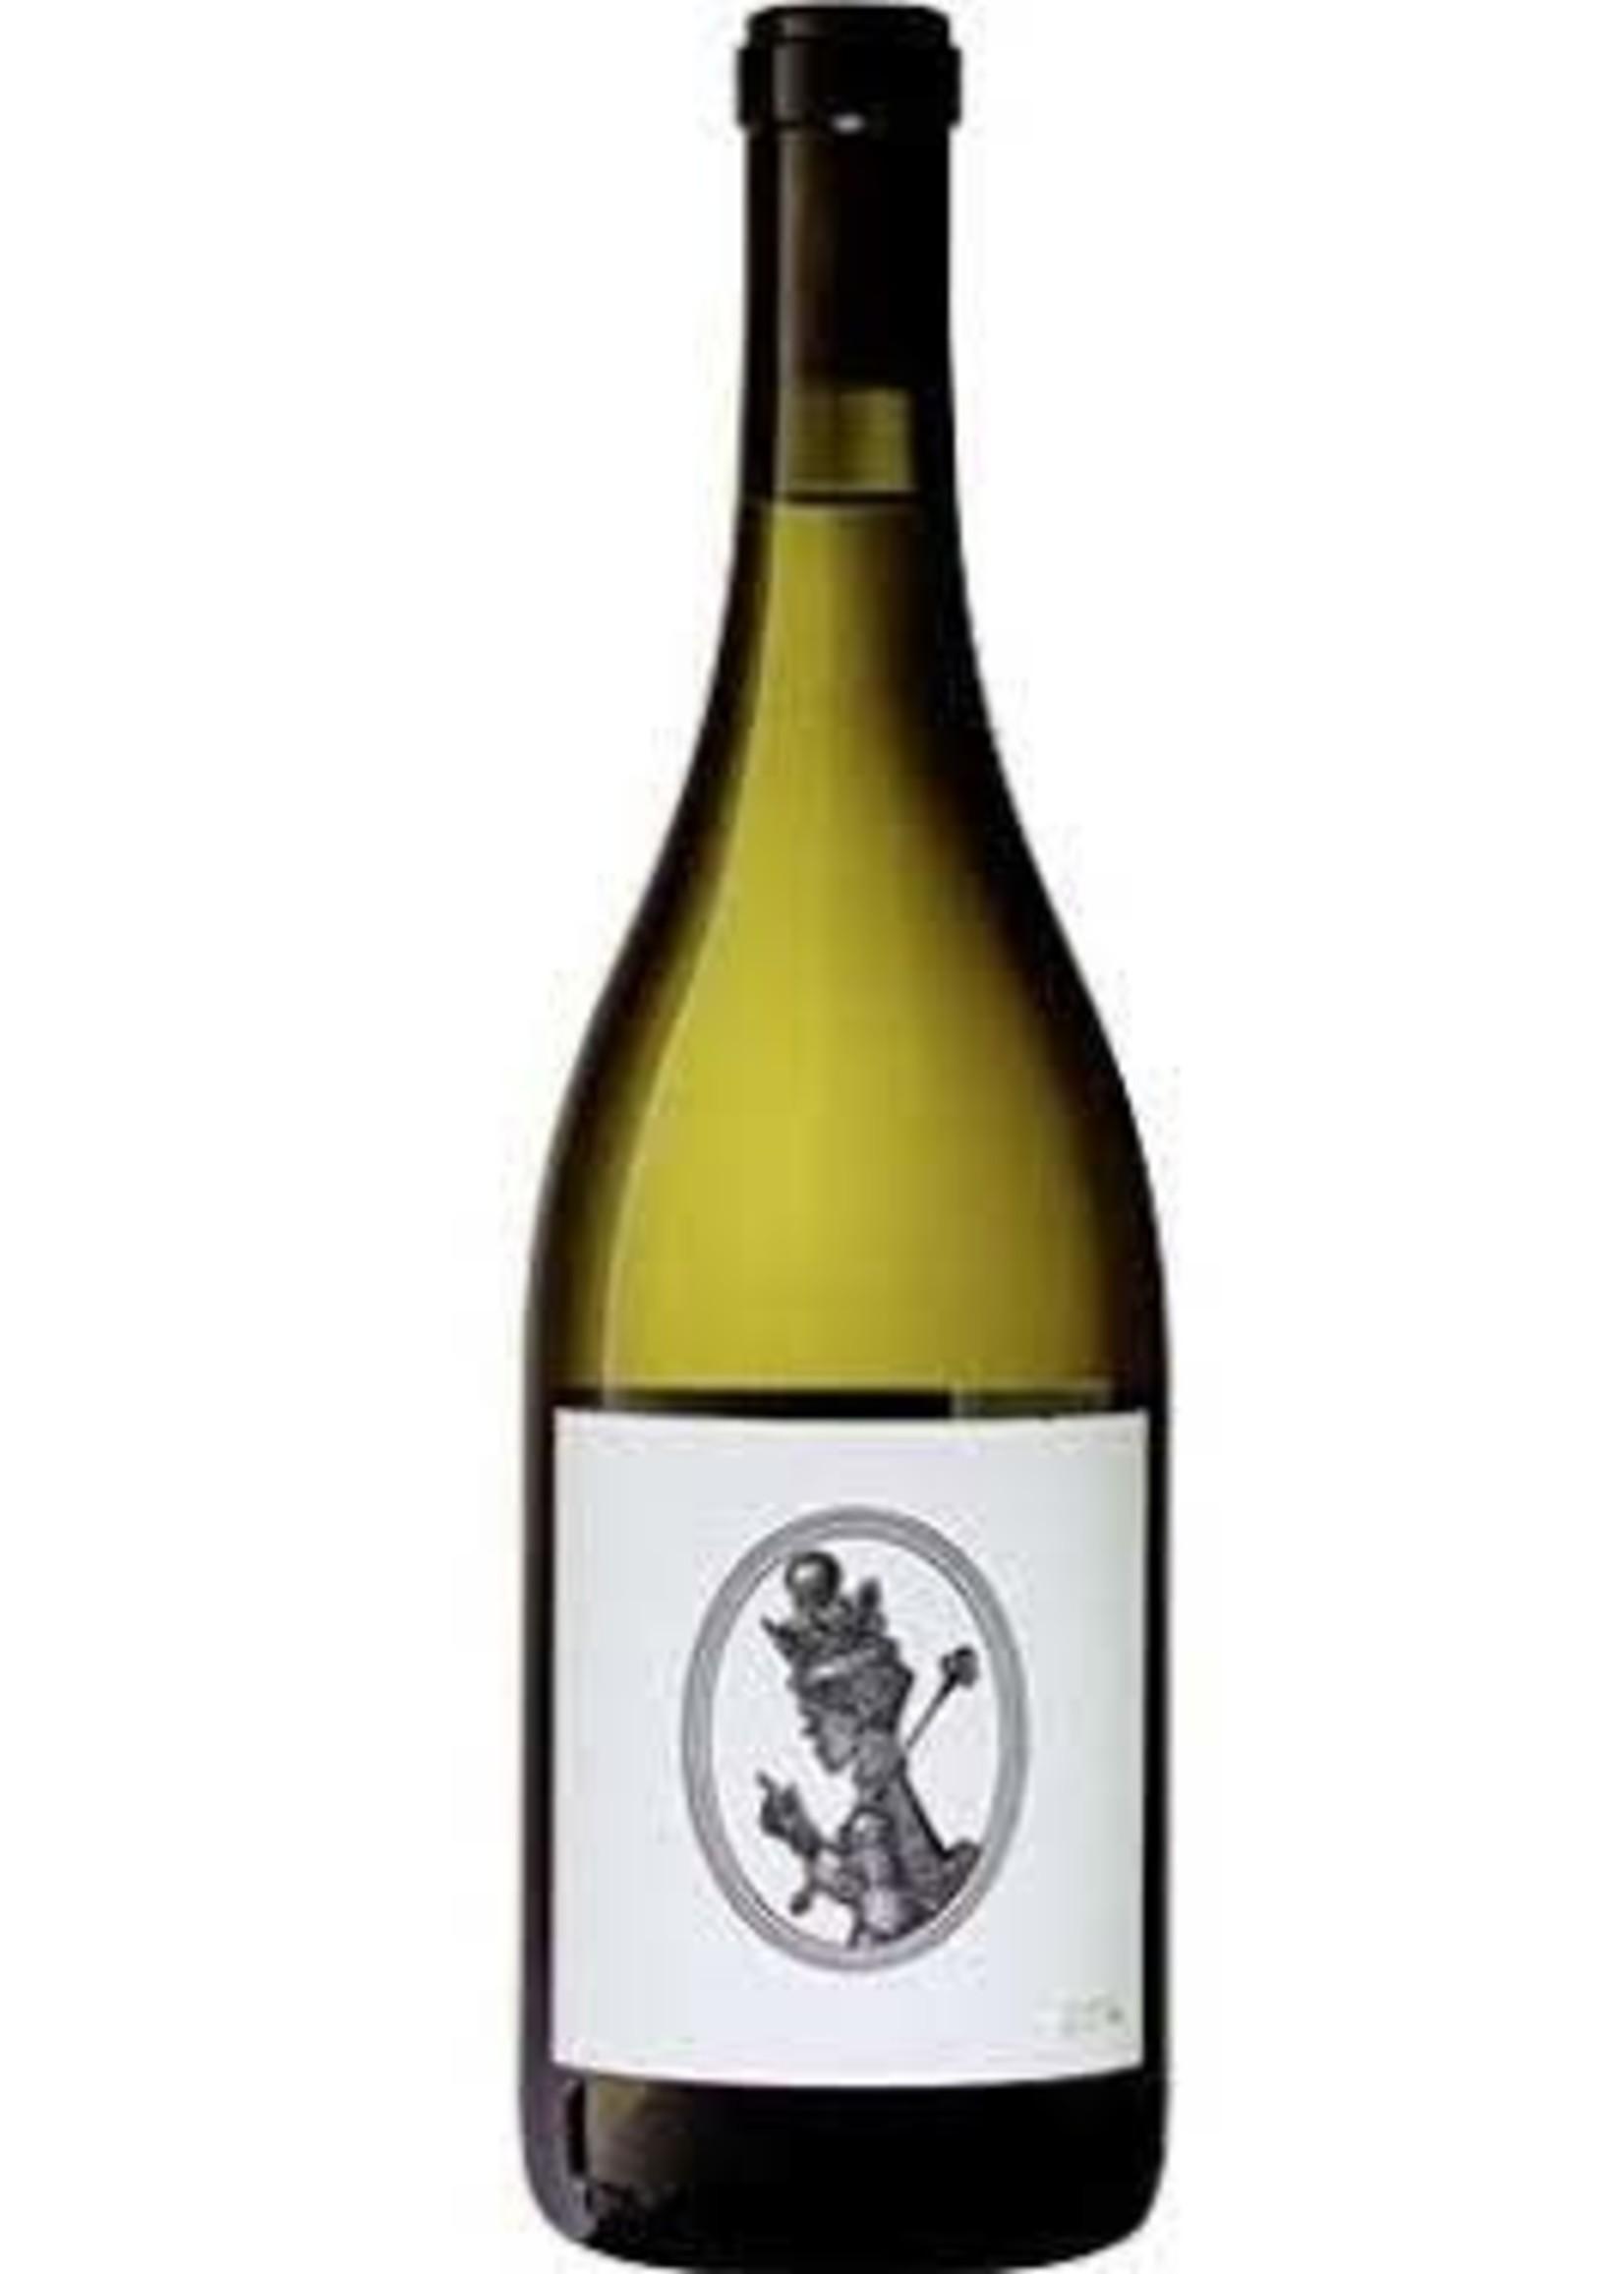 Wonderland Project 2015 The White Queen Chardonnay 750ml